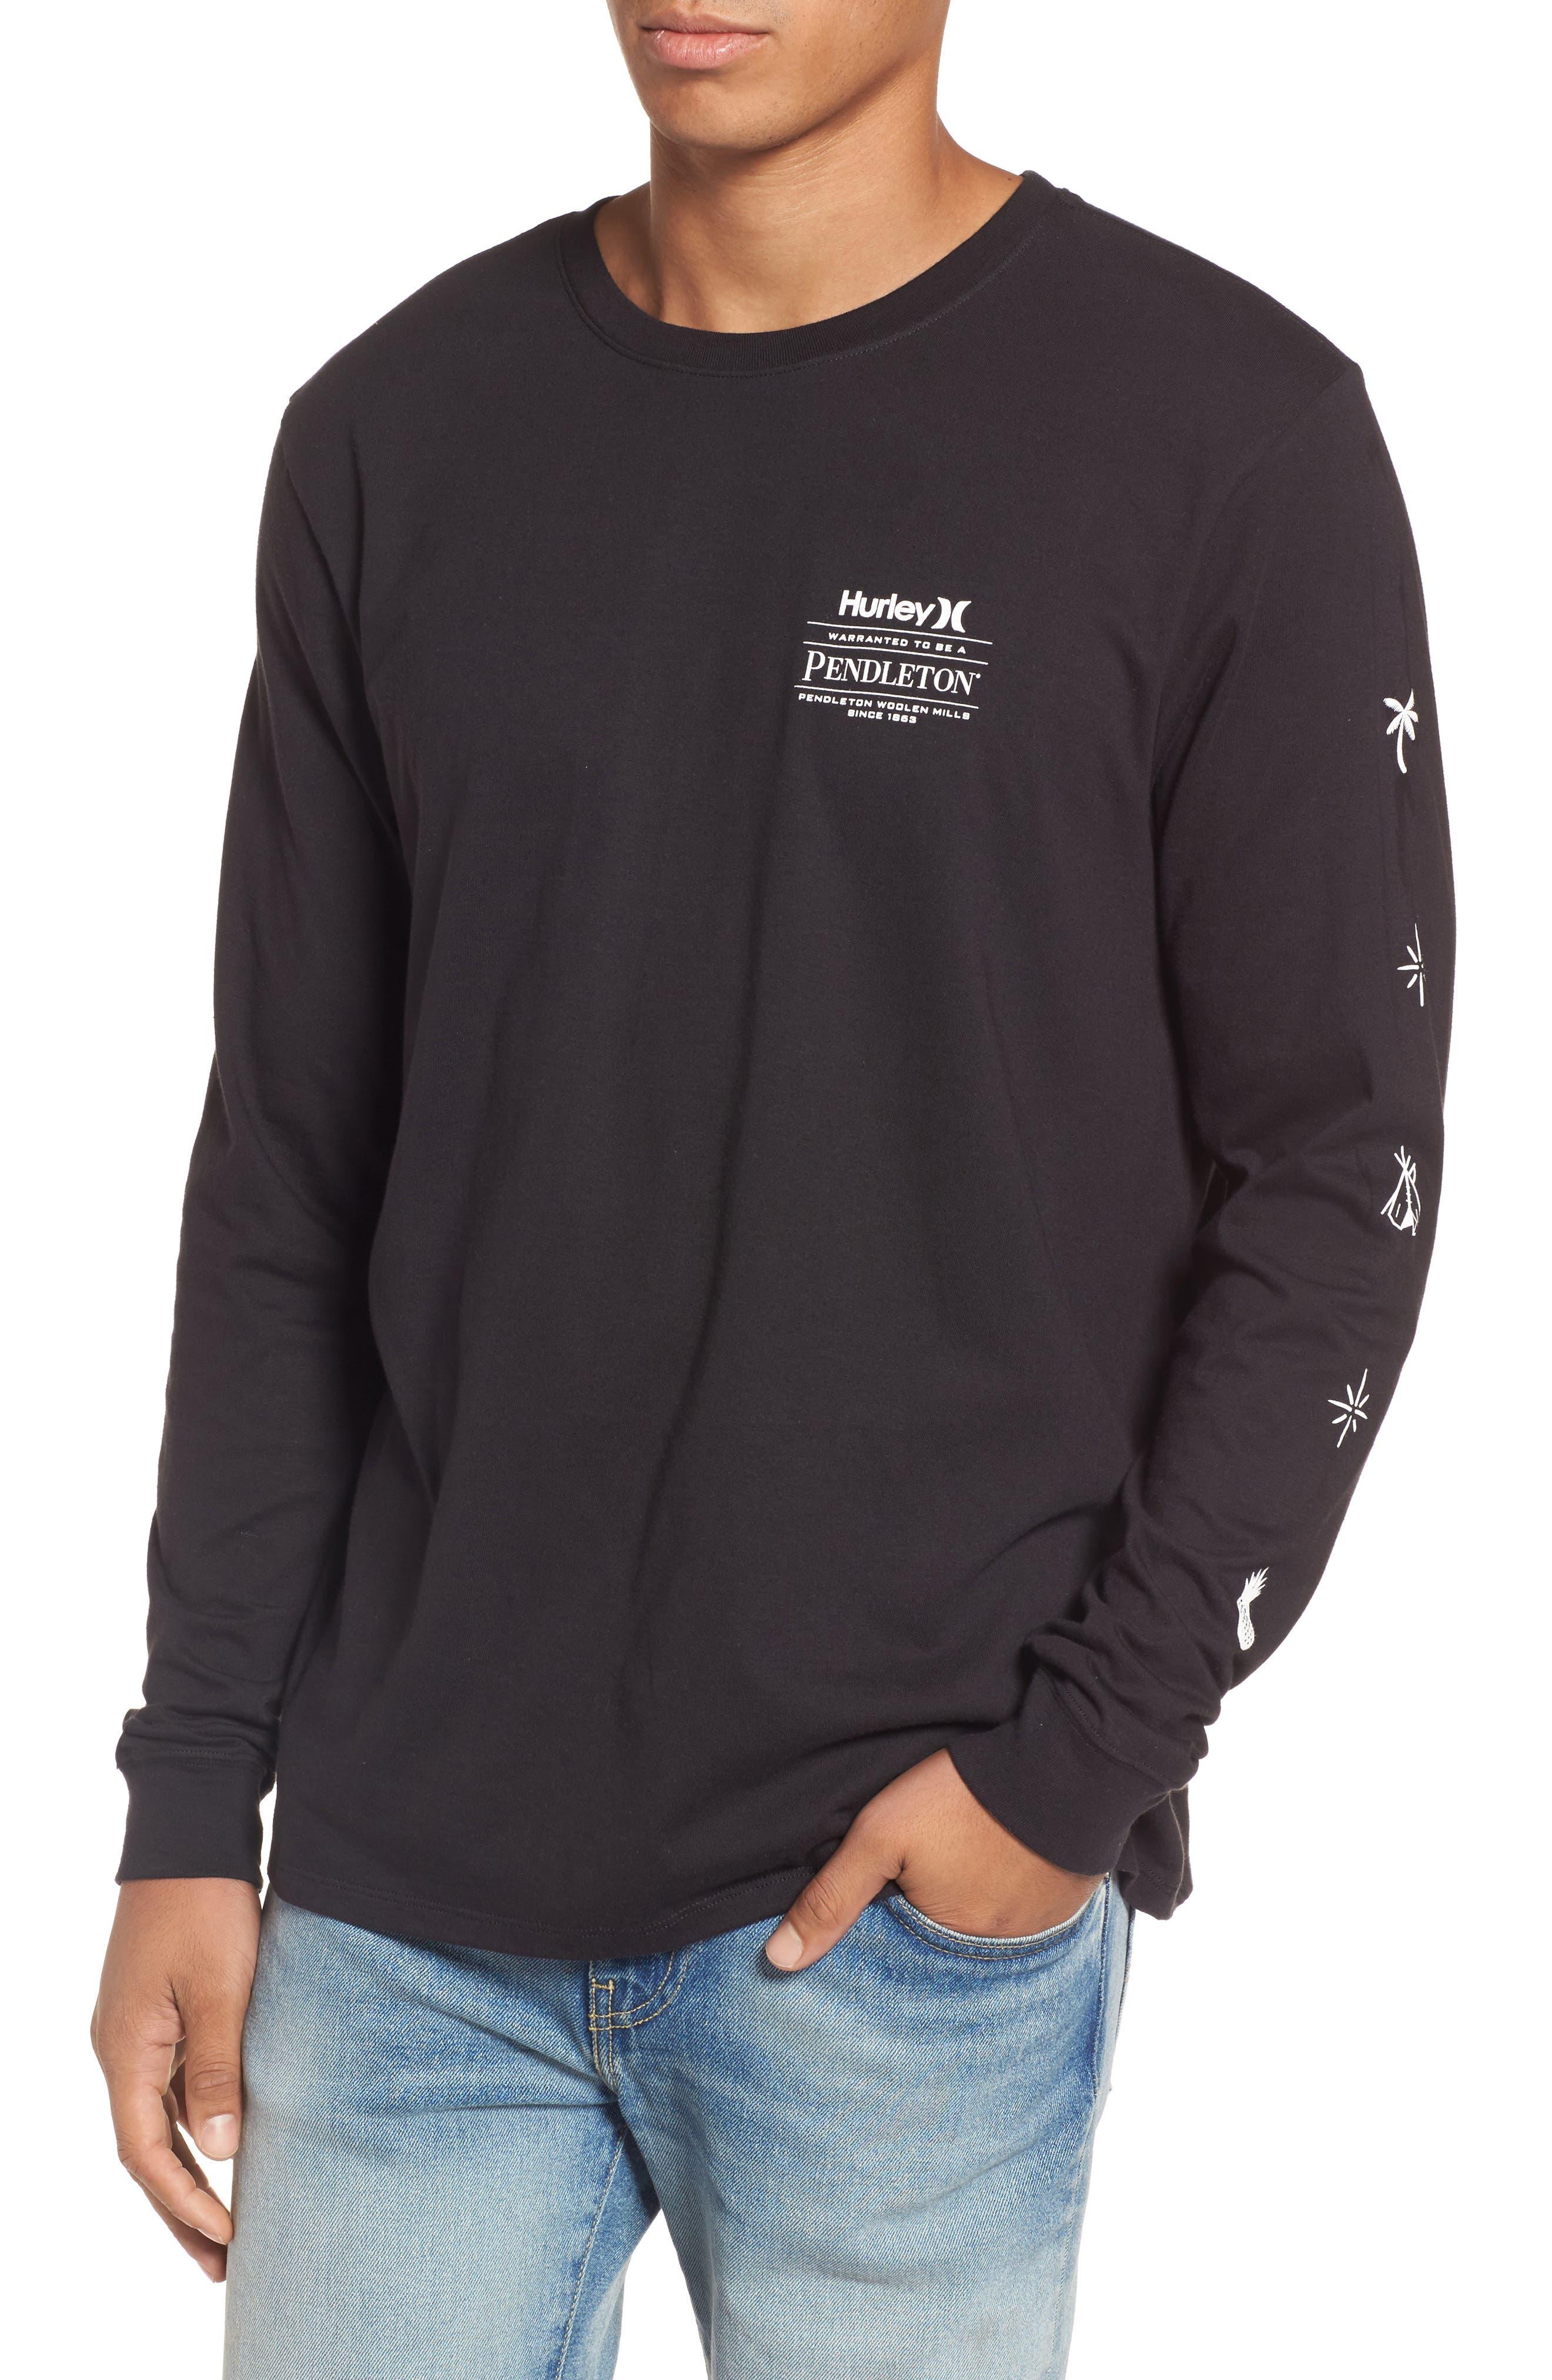 x Pendleton Long Sleeve T-Shirt,                         Main,                         color, Black